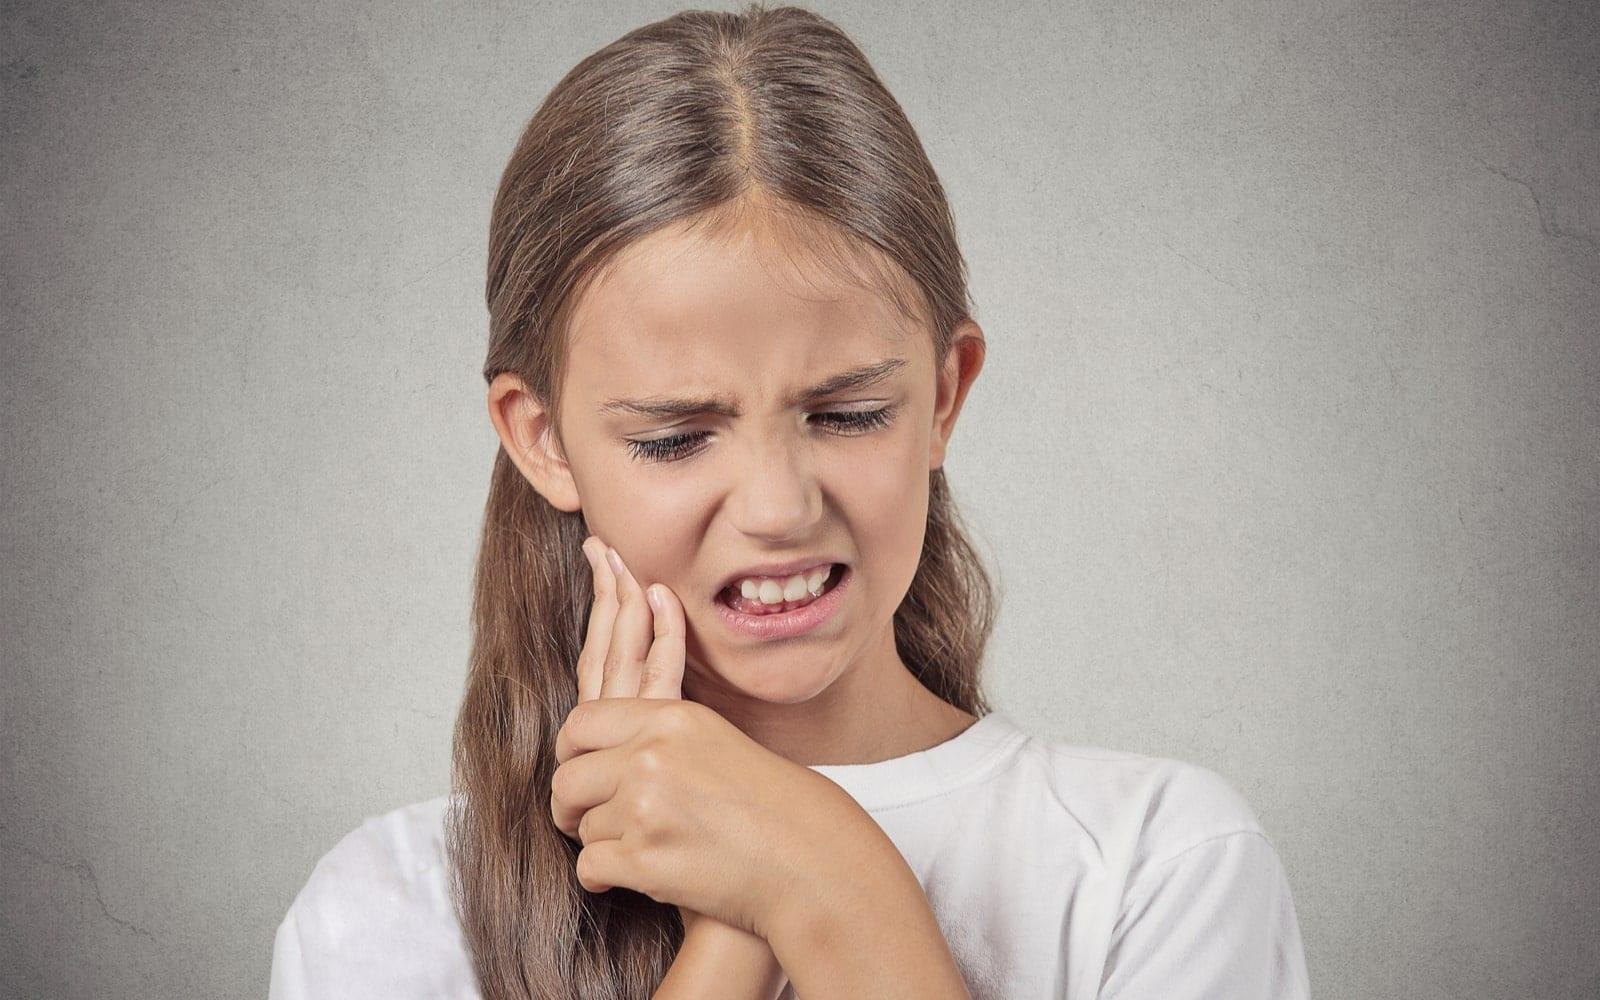 Young Girl Experiencing Sensitive Teeth